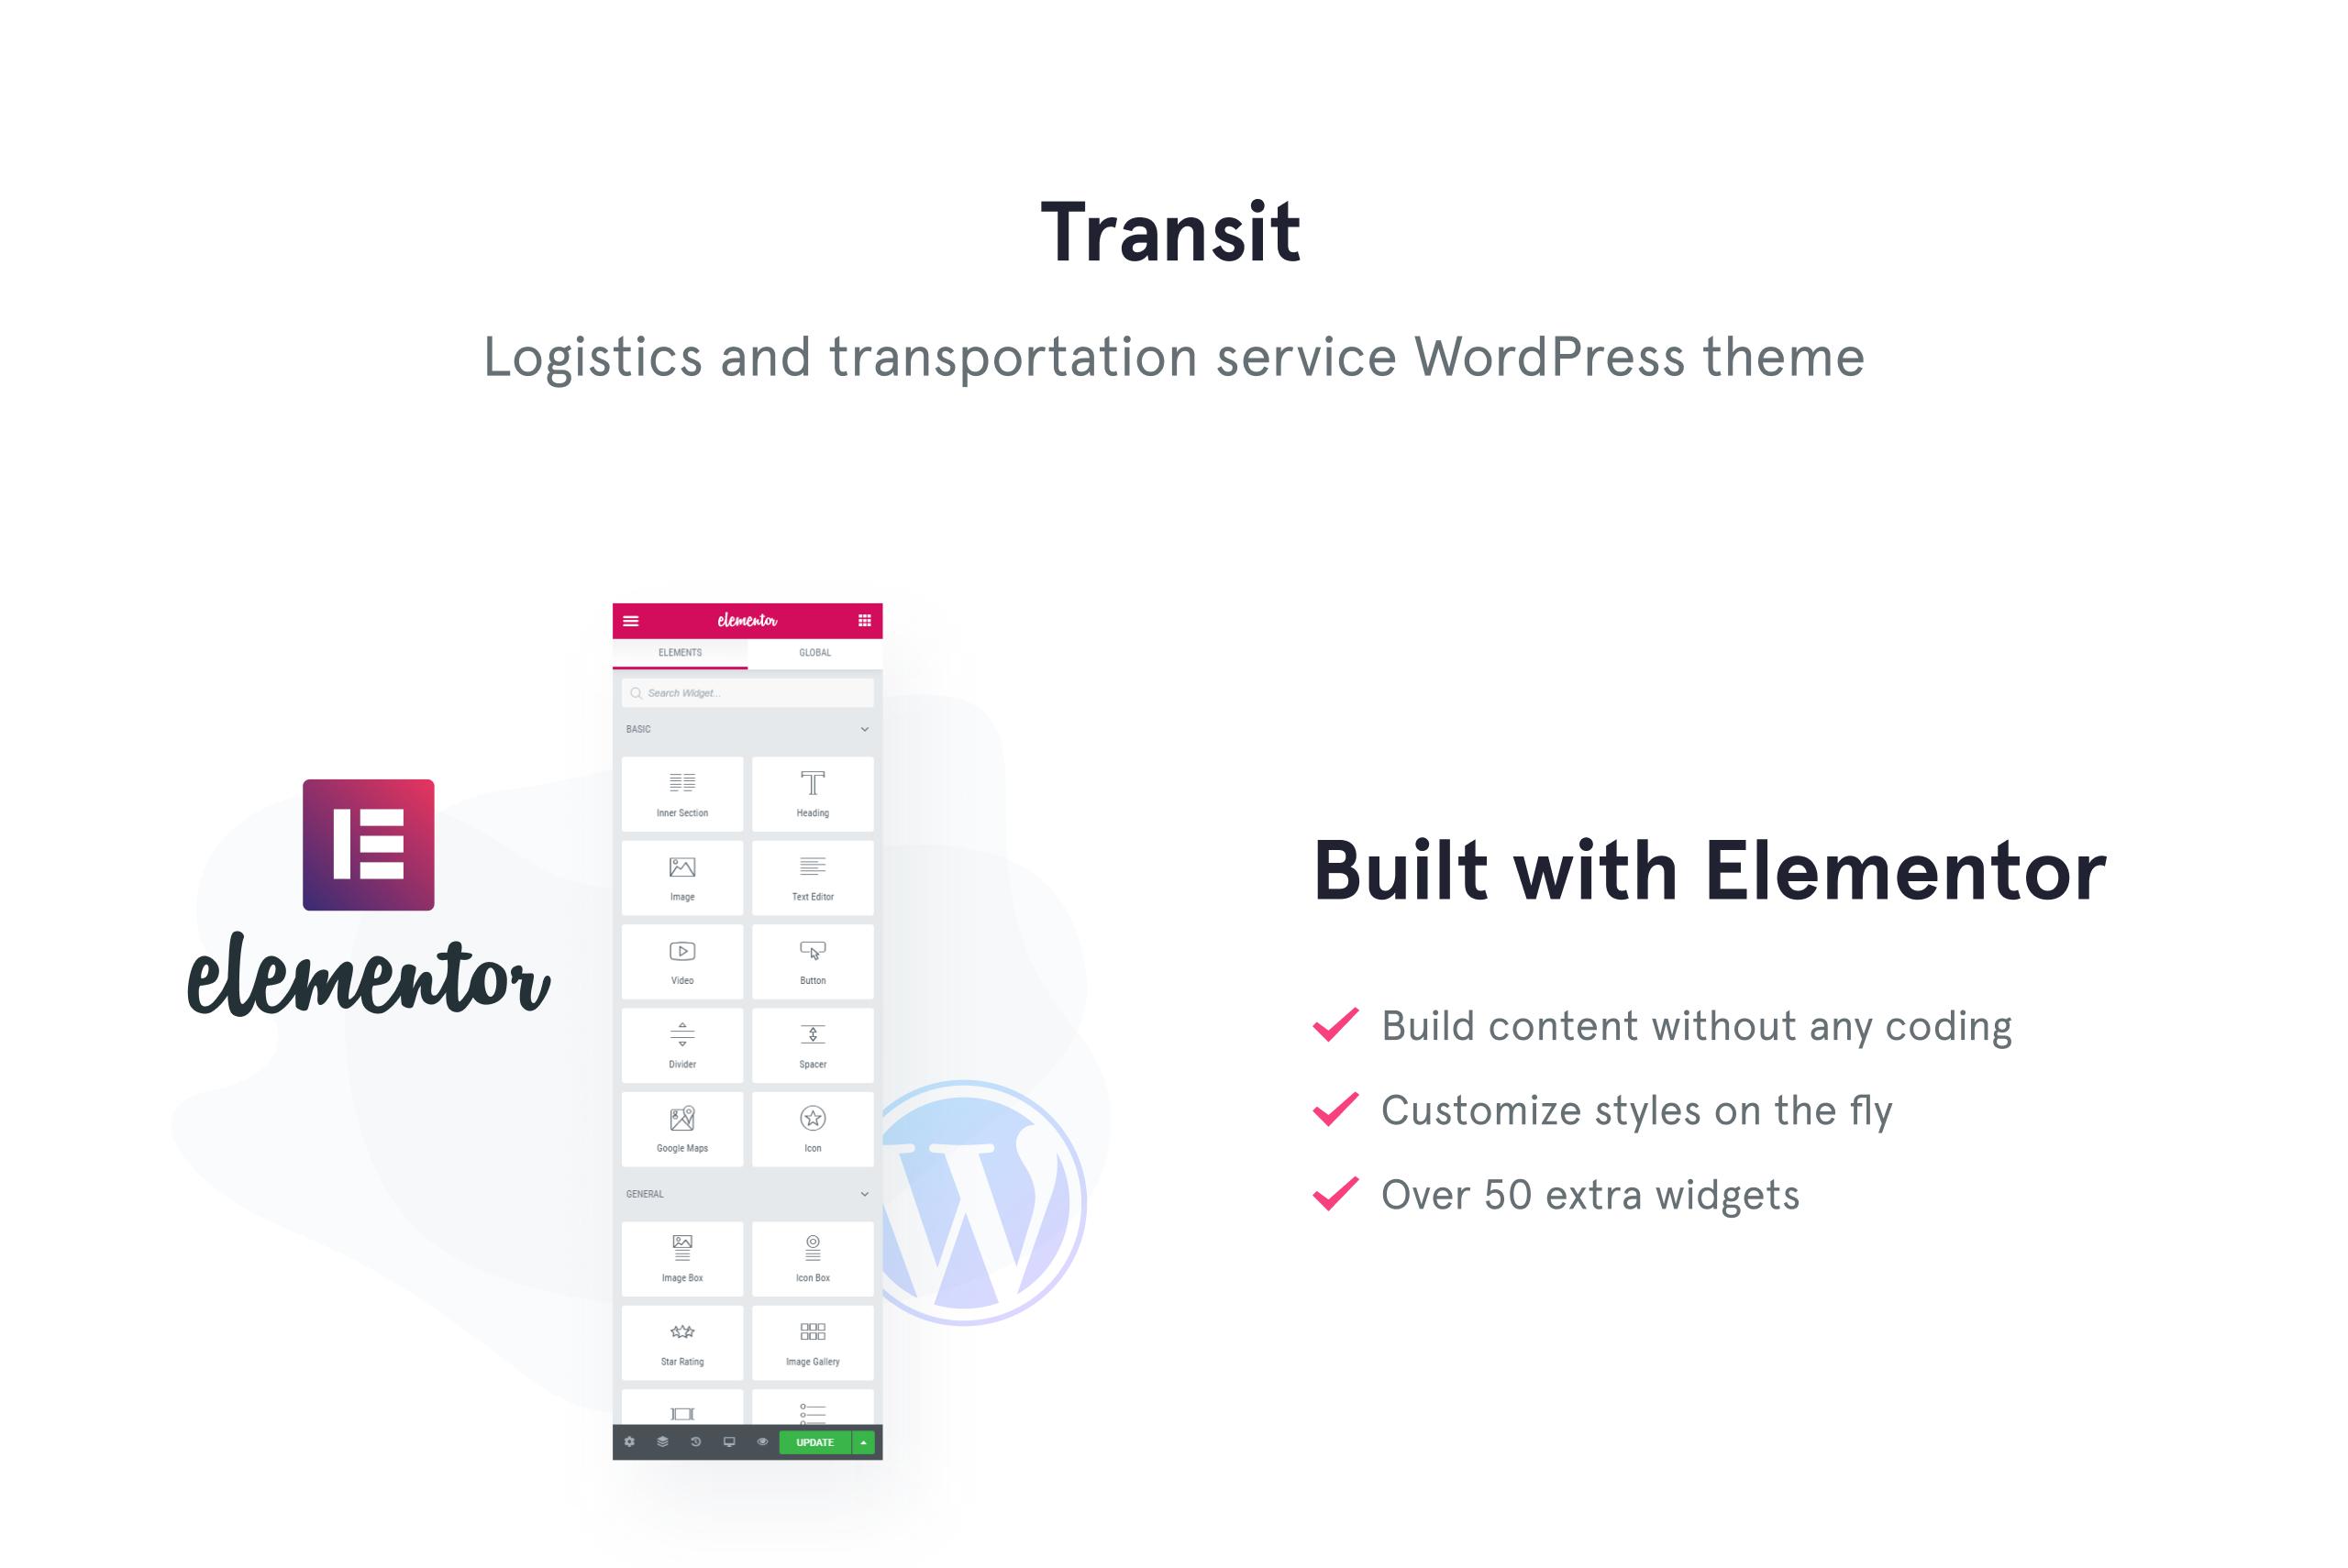 Transit - Logistics and Transportation Service WordPress Theme